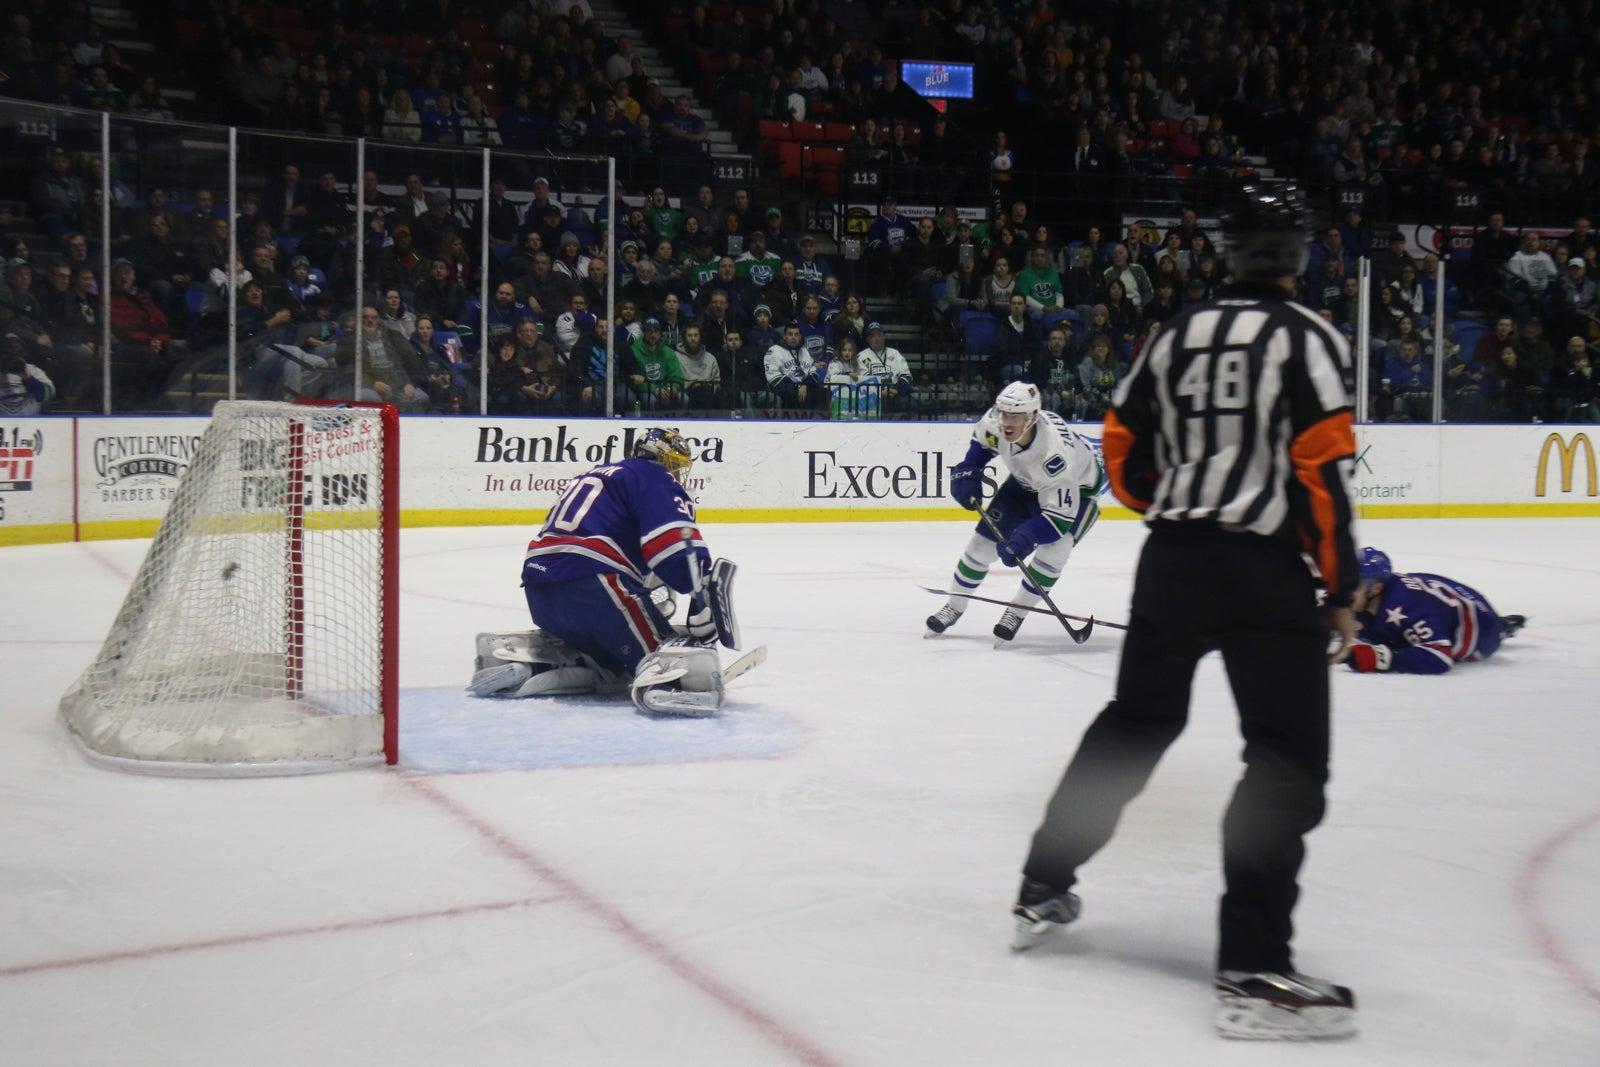 Zalewski Shines Again in Comets Win